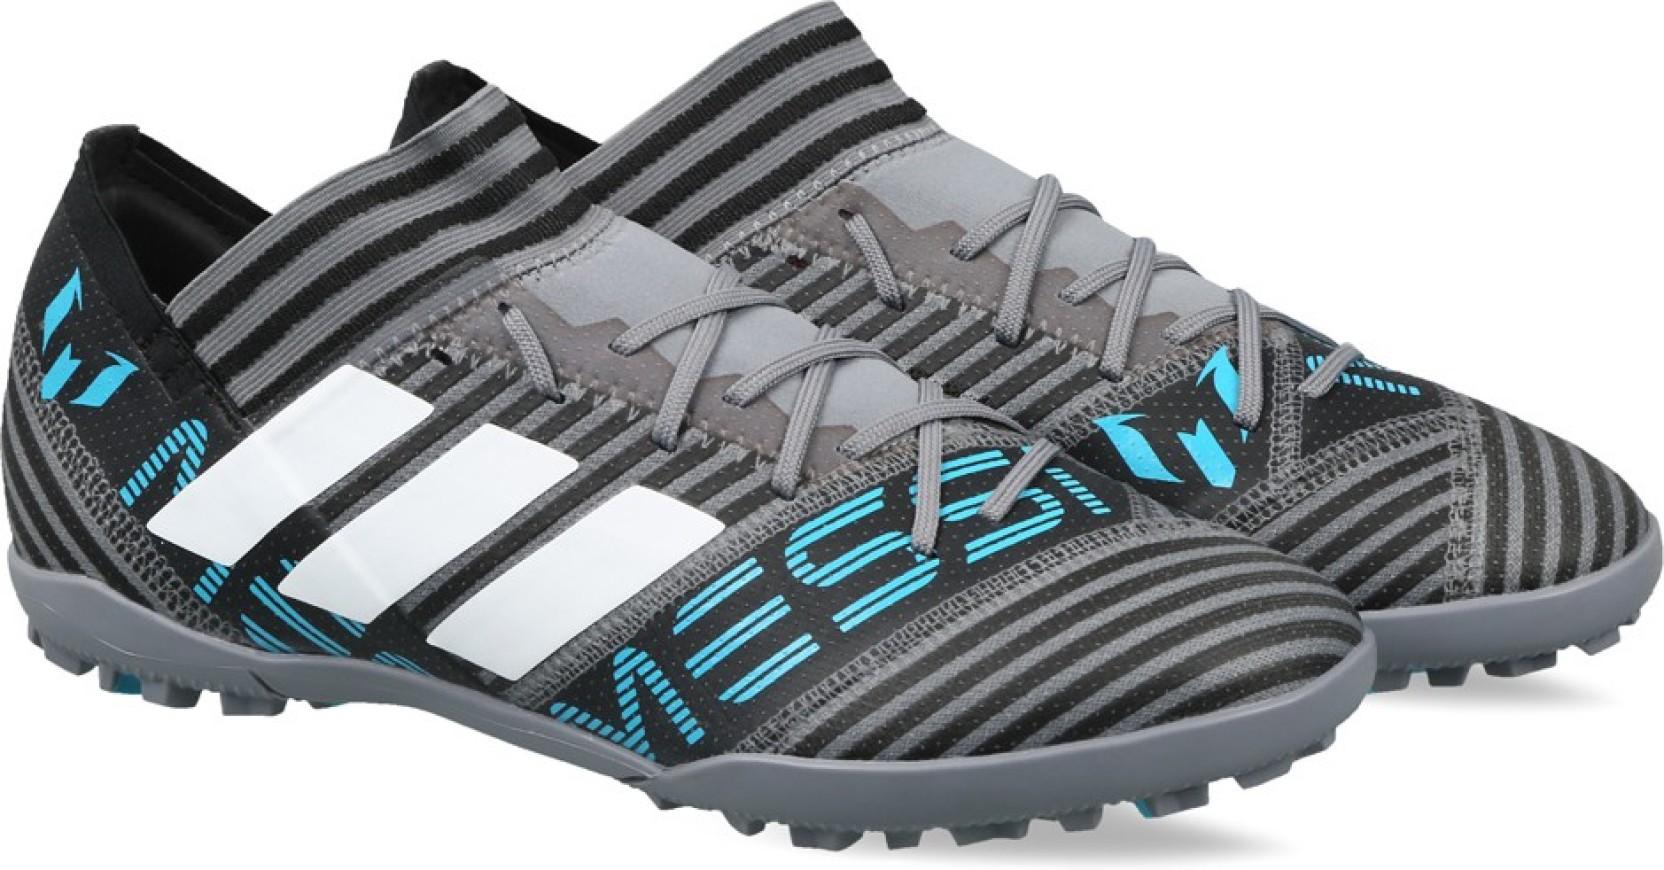 75e9406c4 ADIDAS NEMEZIZ MESSI TANGO 17.3 TF Football Shoes For Men (Blue, Grey)